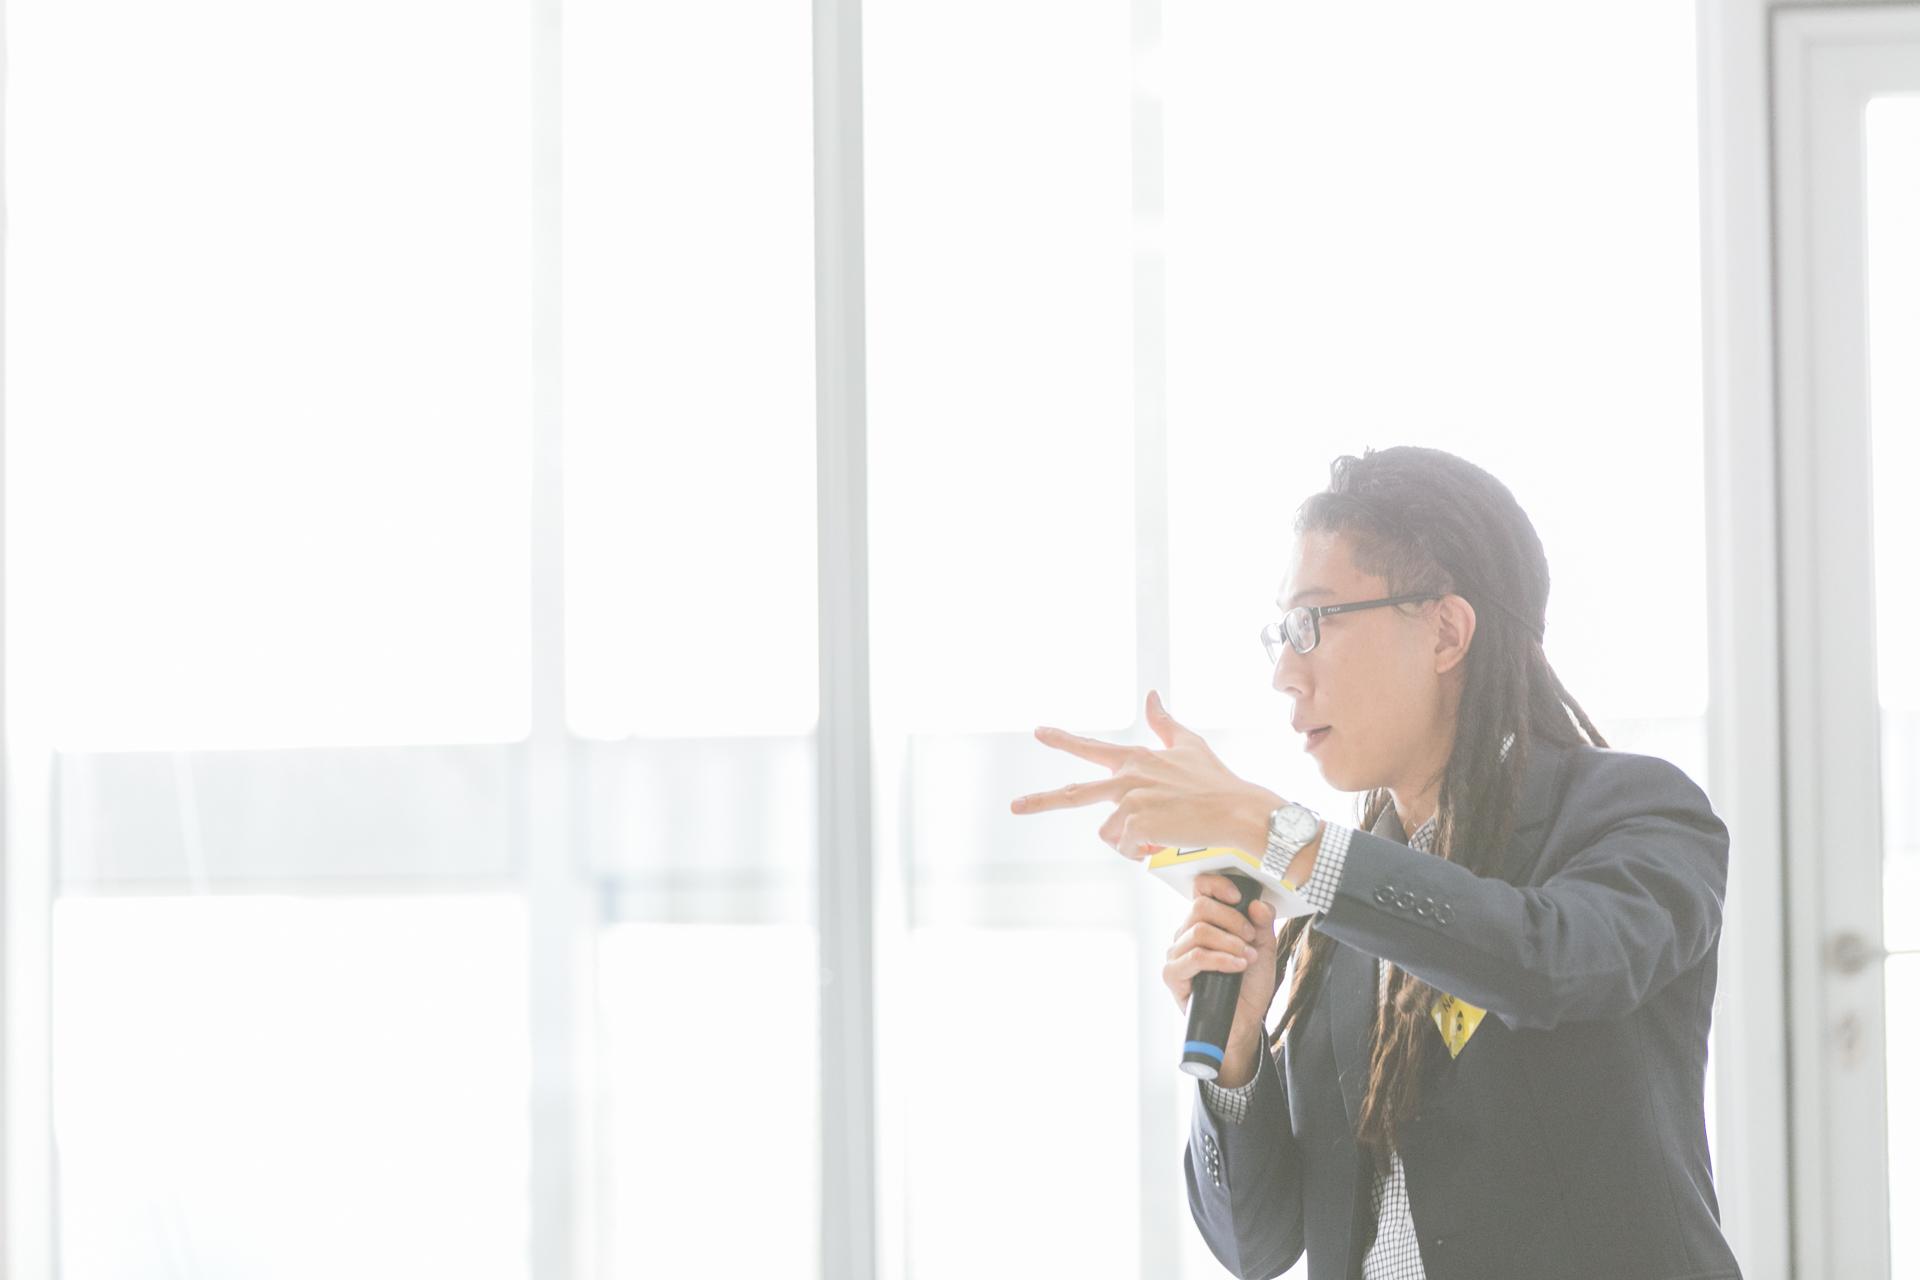 taiwan-startup-stadium-nemo-chu-500-startups-big-camp-distribution.jpg